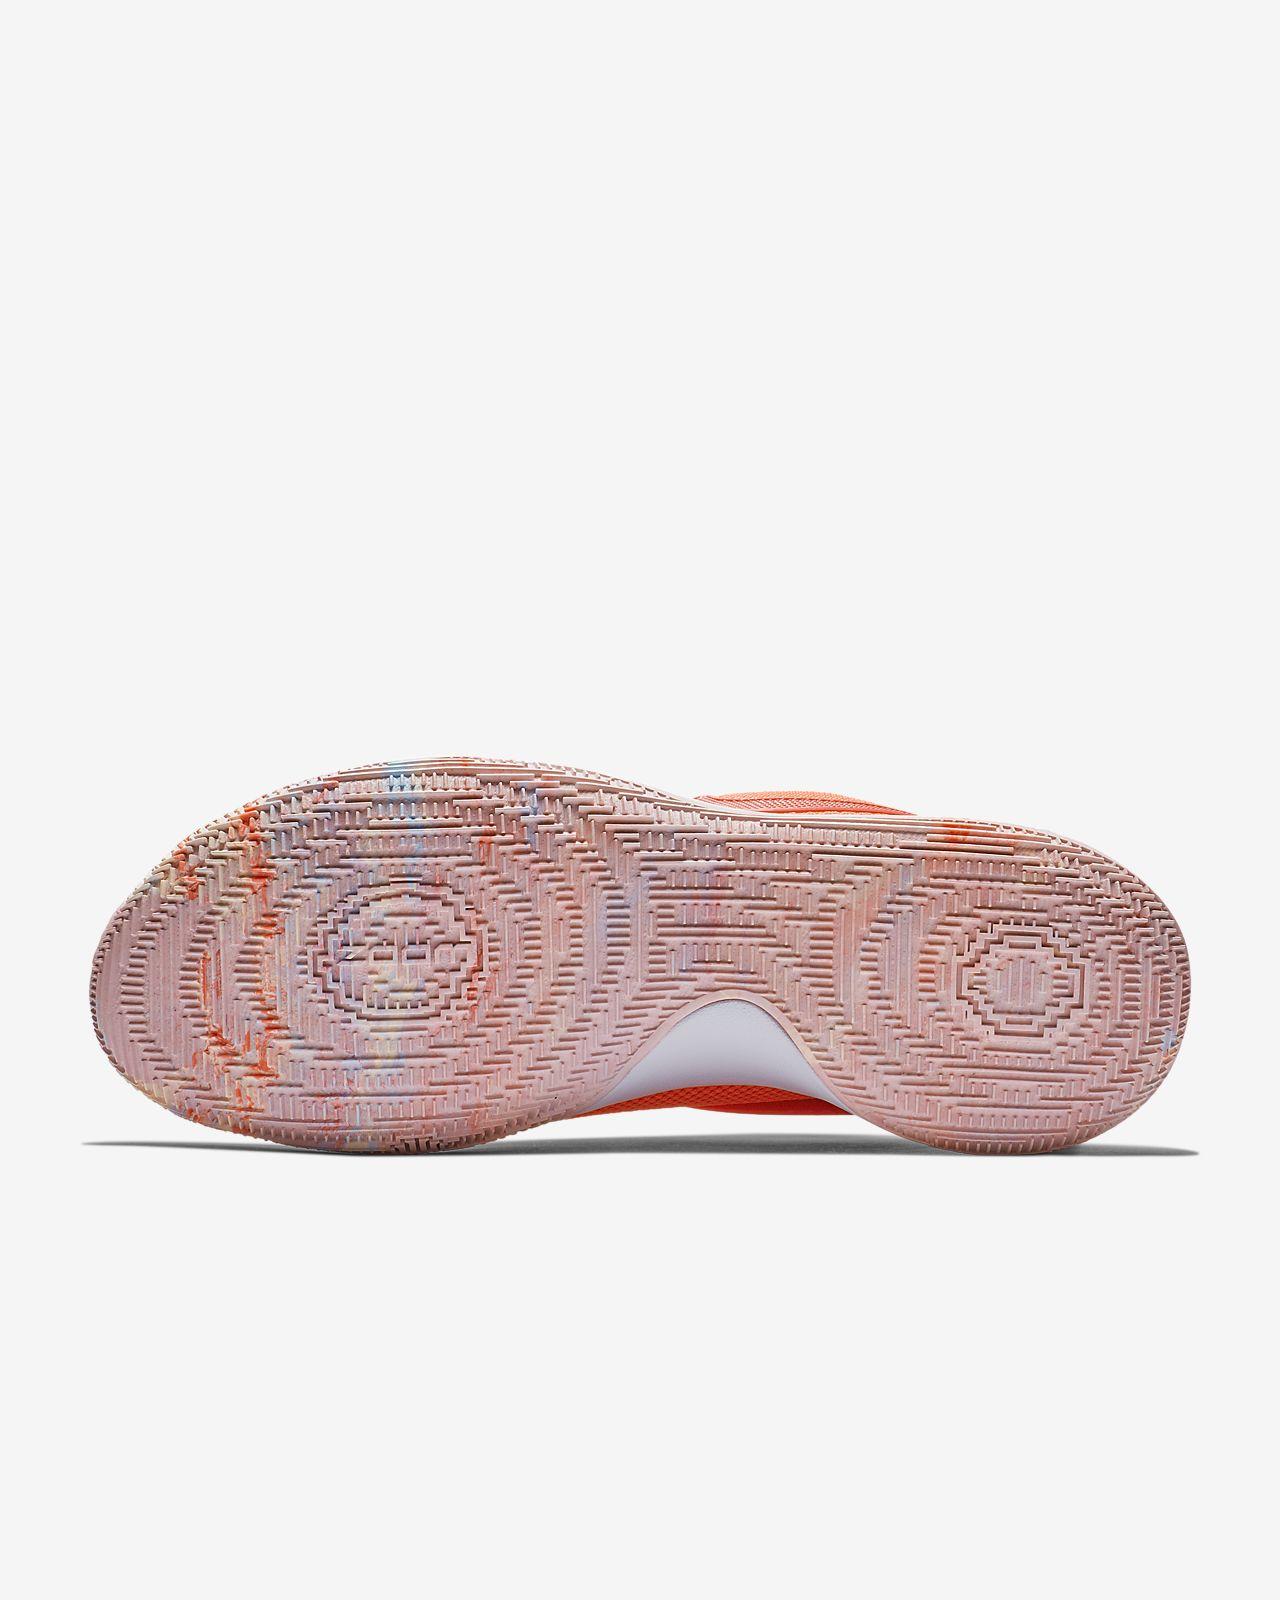 bbb48267b3b Official Nike Kyrie IV Thread